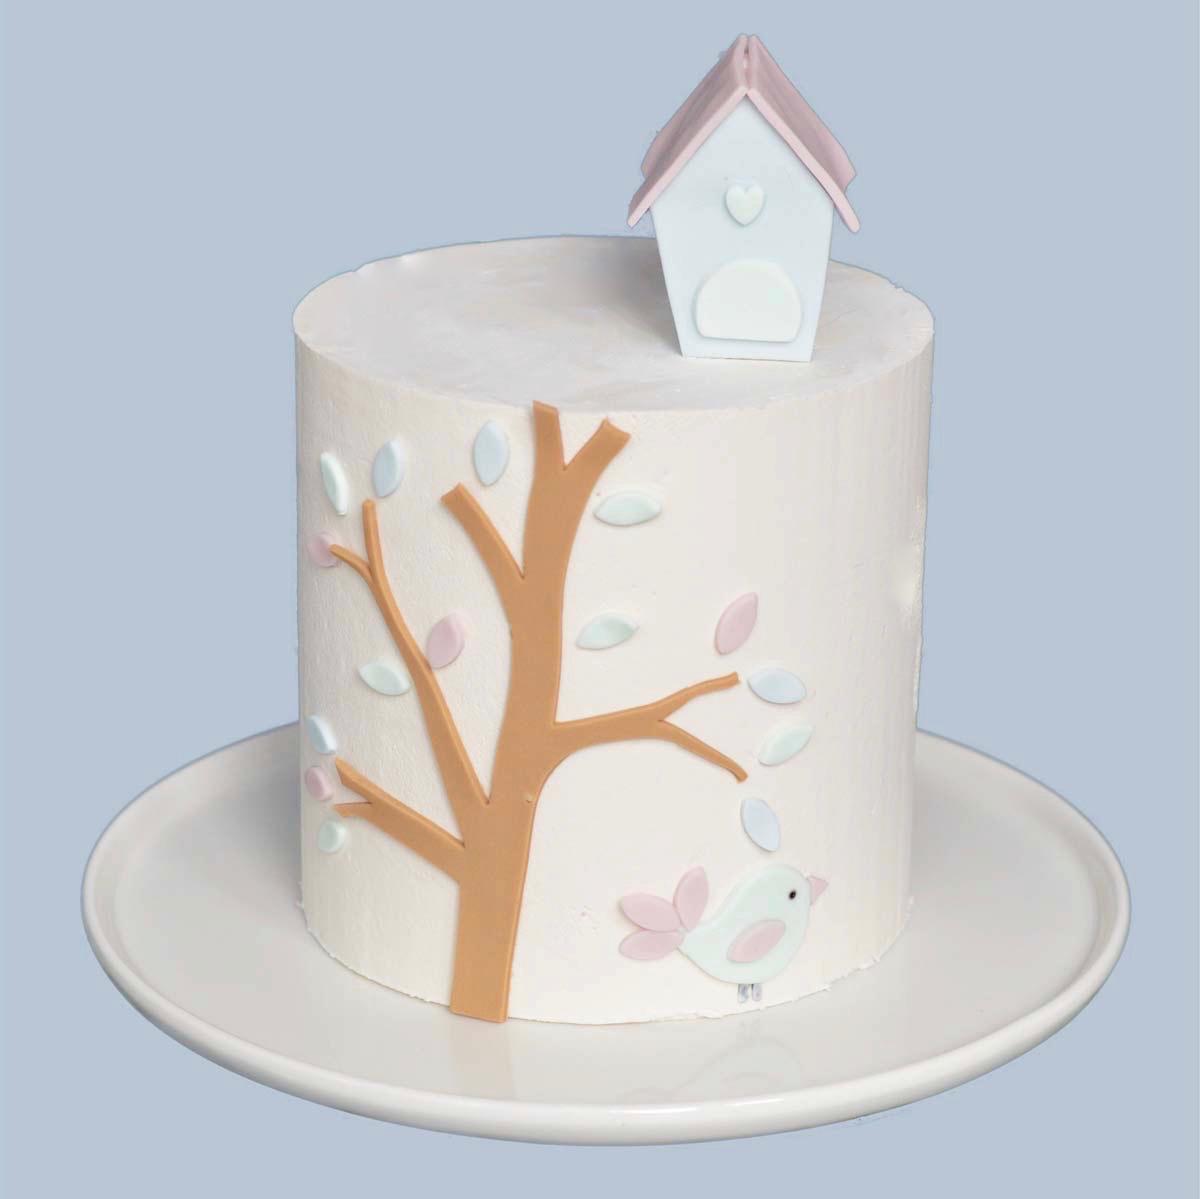 Remarkable Bird House Birthday Cake Caroline Goulding Cake Design Download Free Architecture Designs Scobabritishbridgeorg